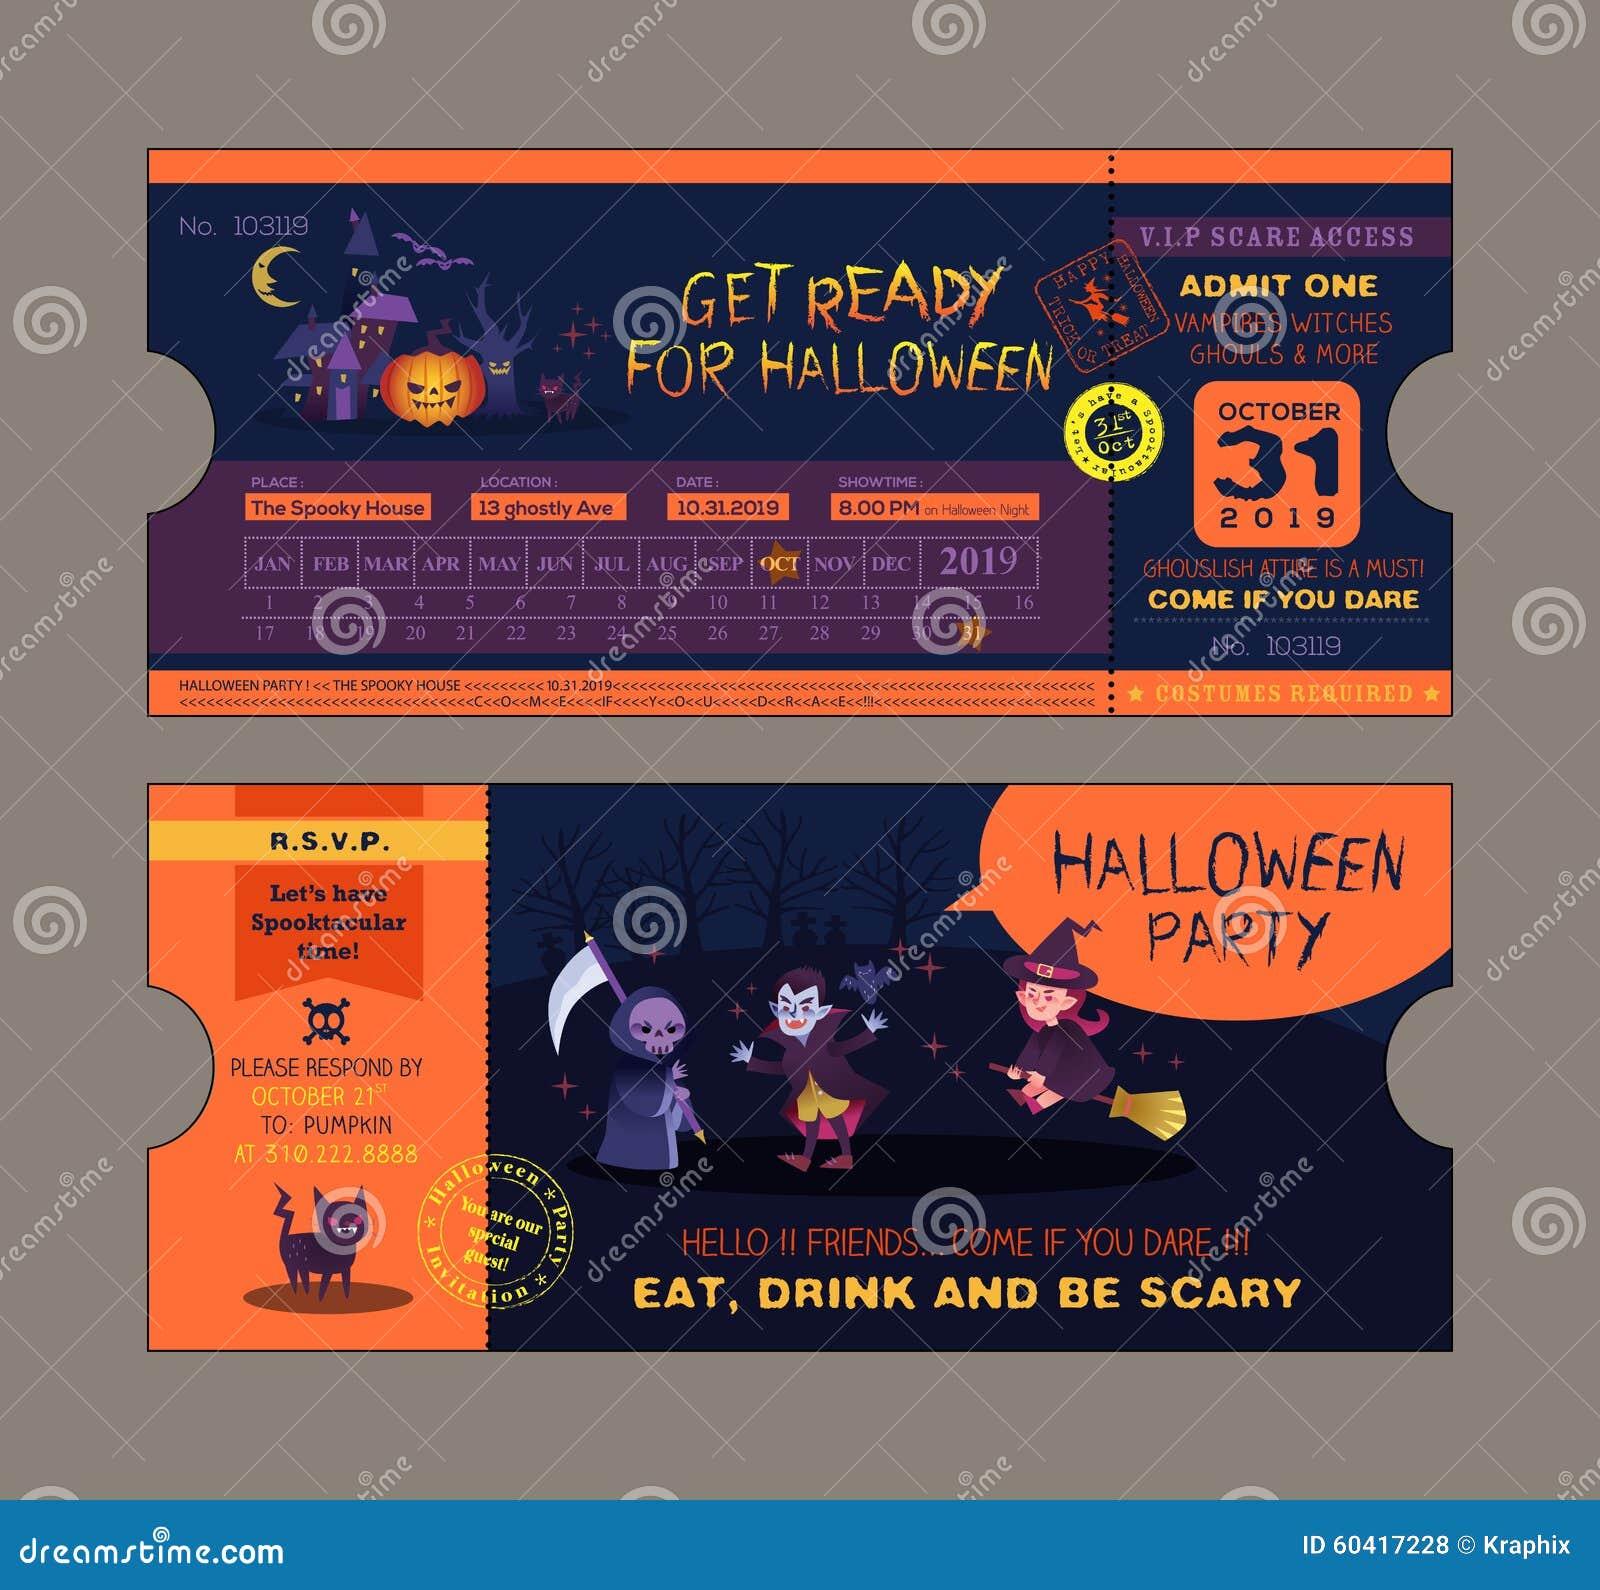 Halloween Party Ticket Card Template Vector